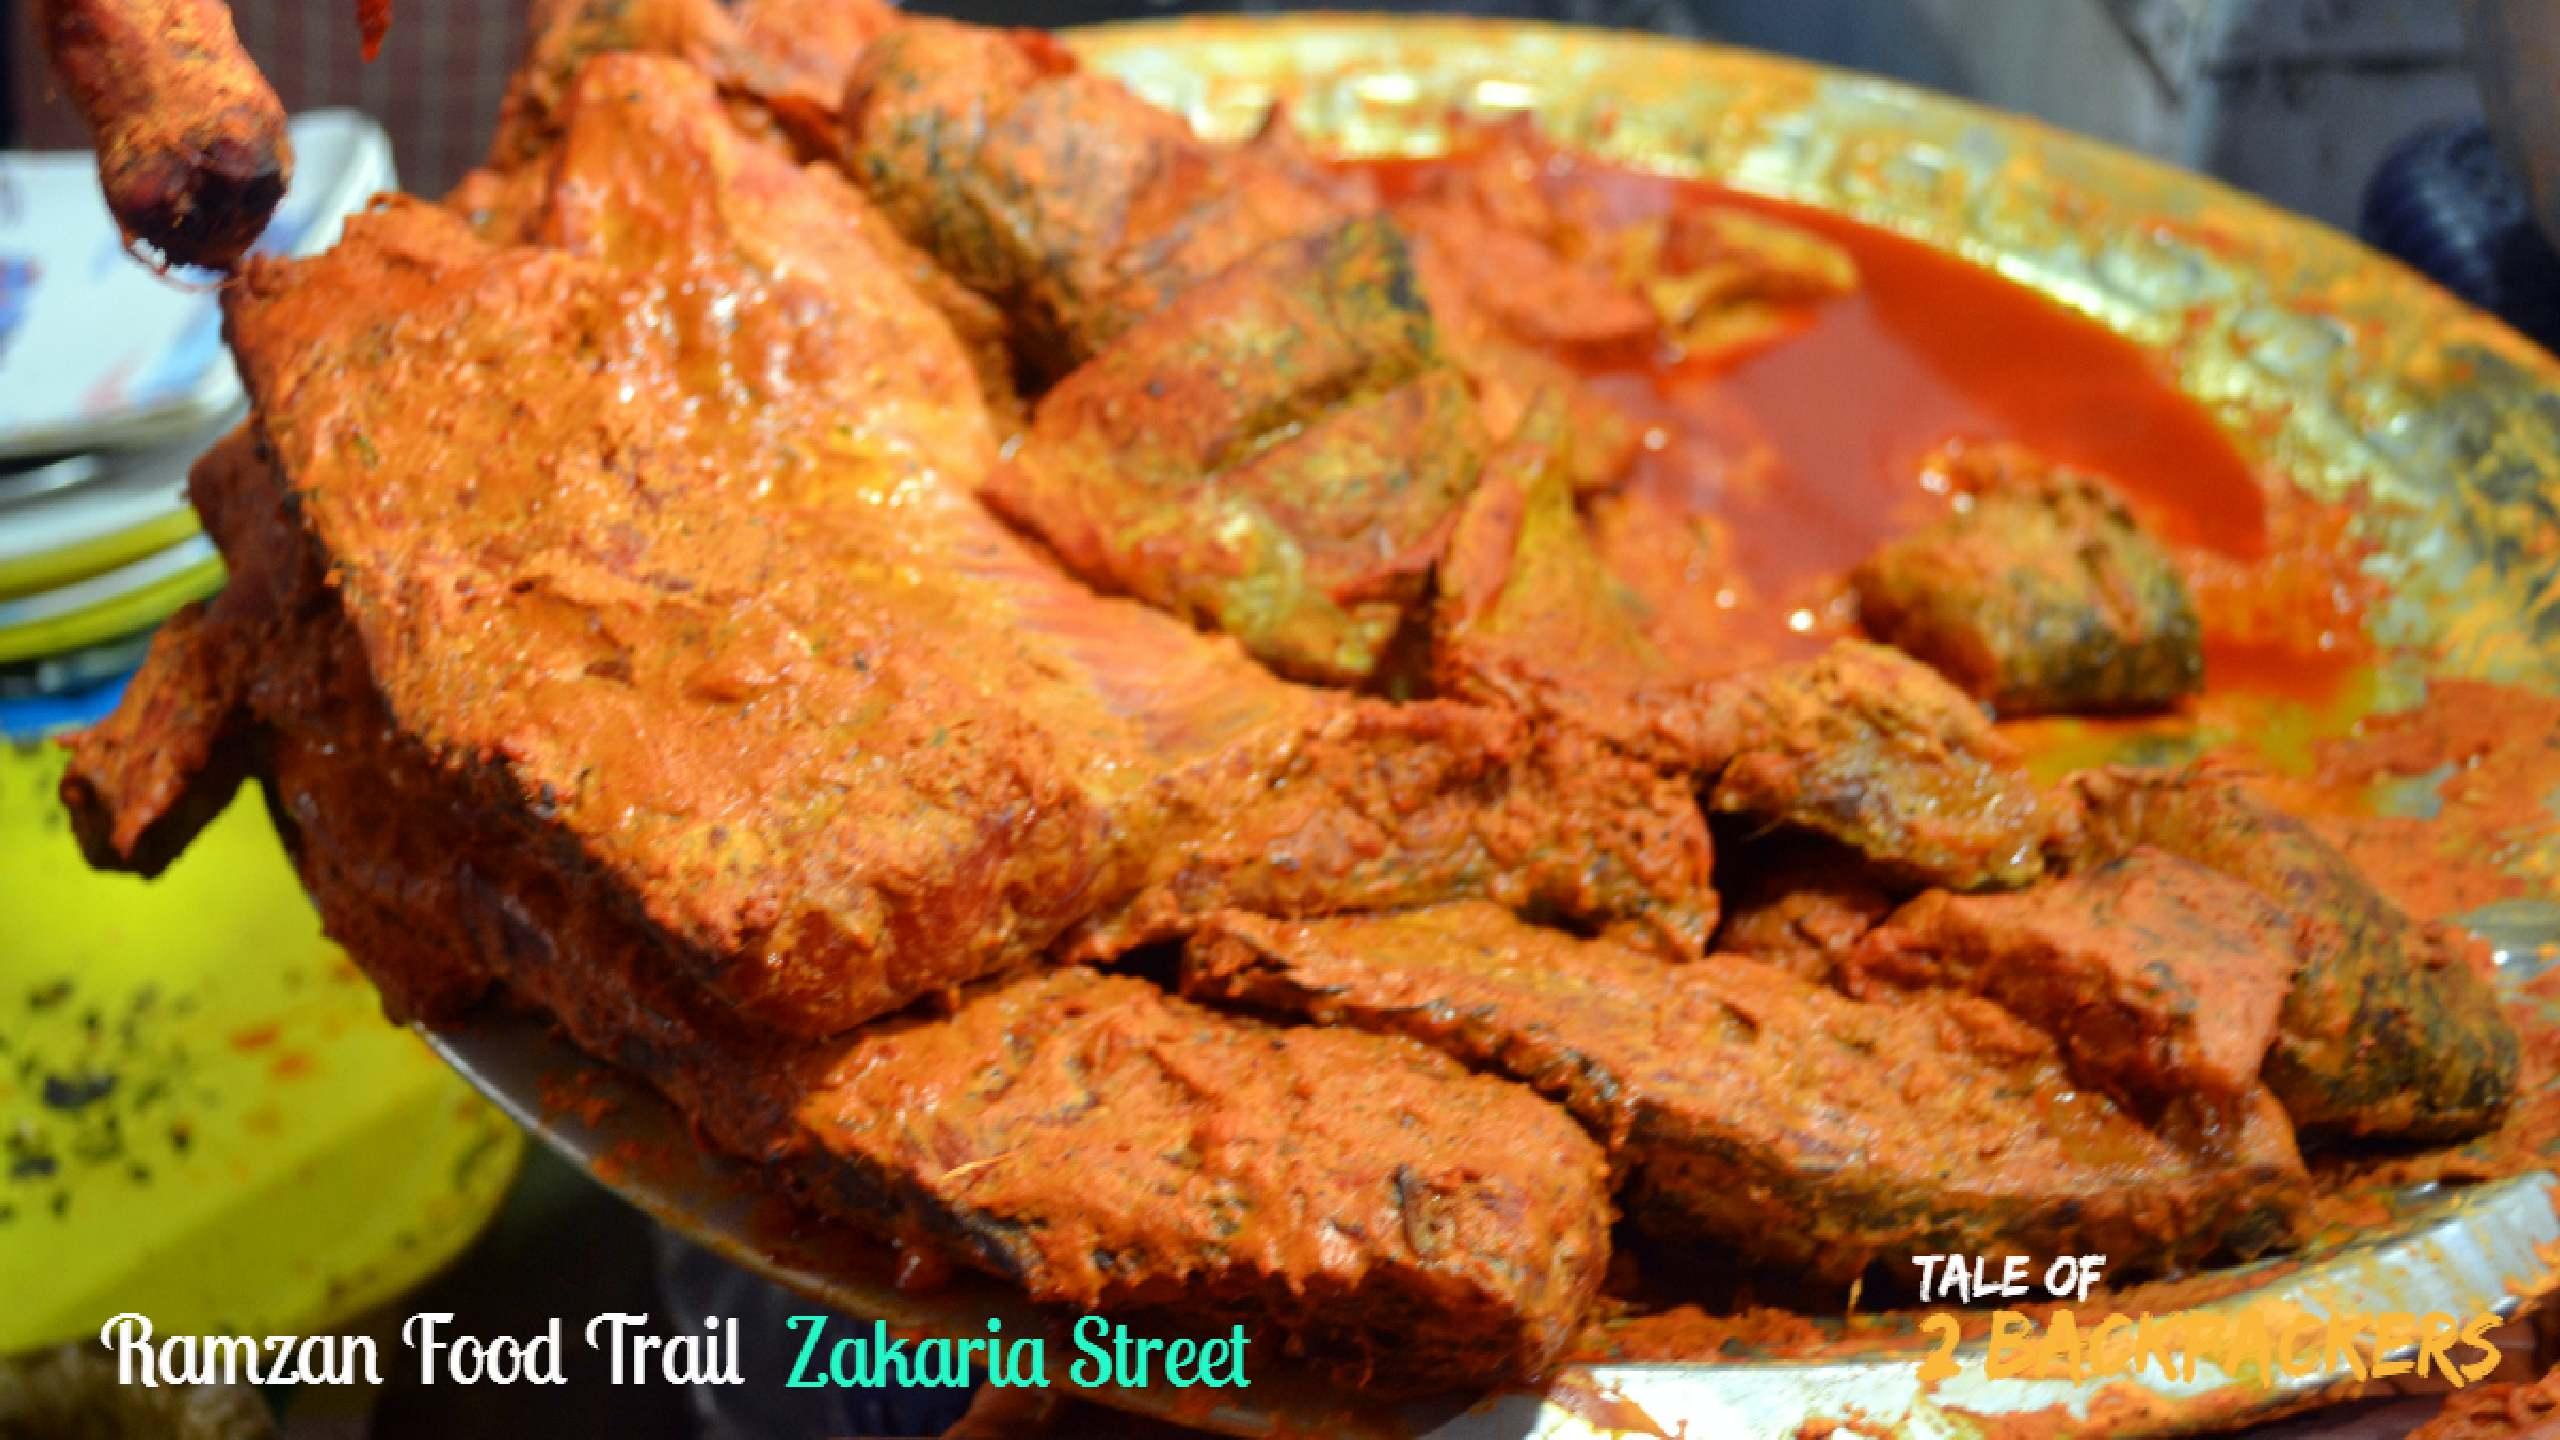 Ramzan Food Trail Zakaria Street Kolkata